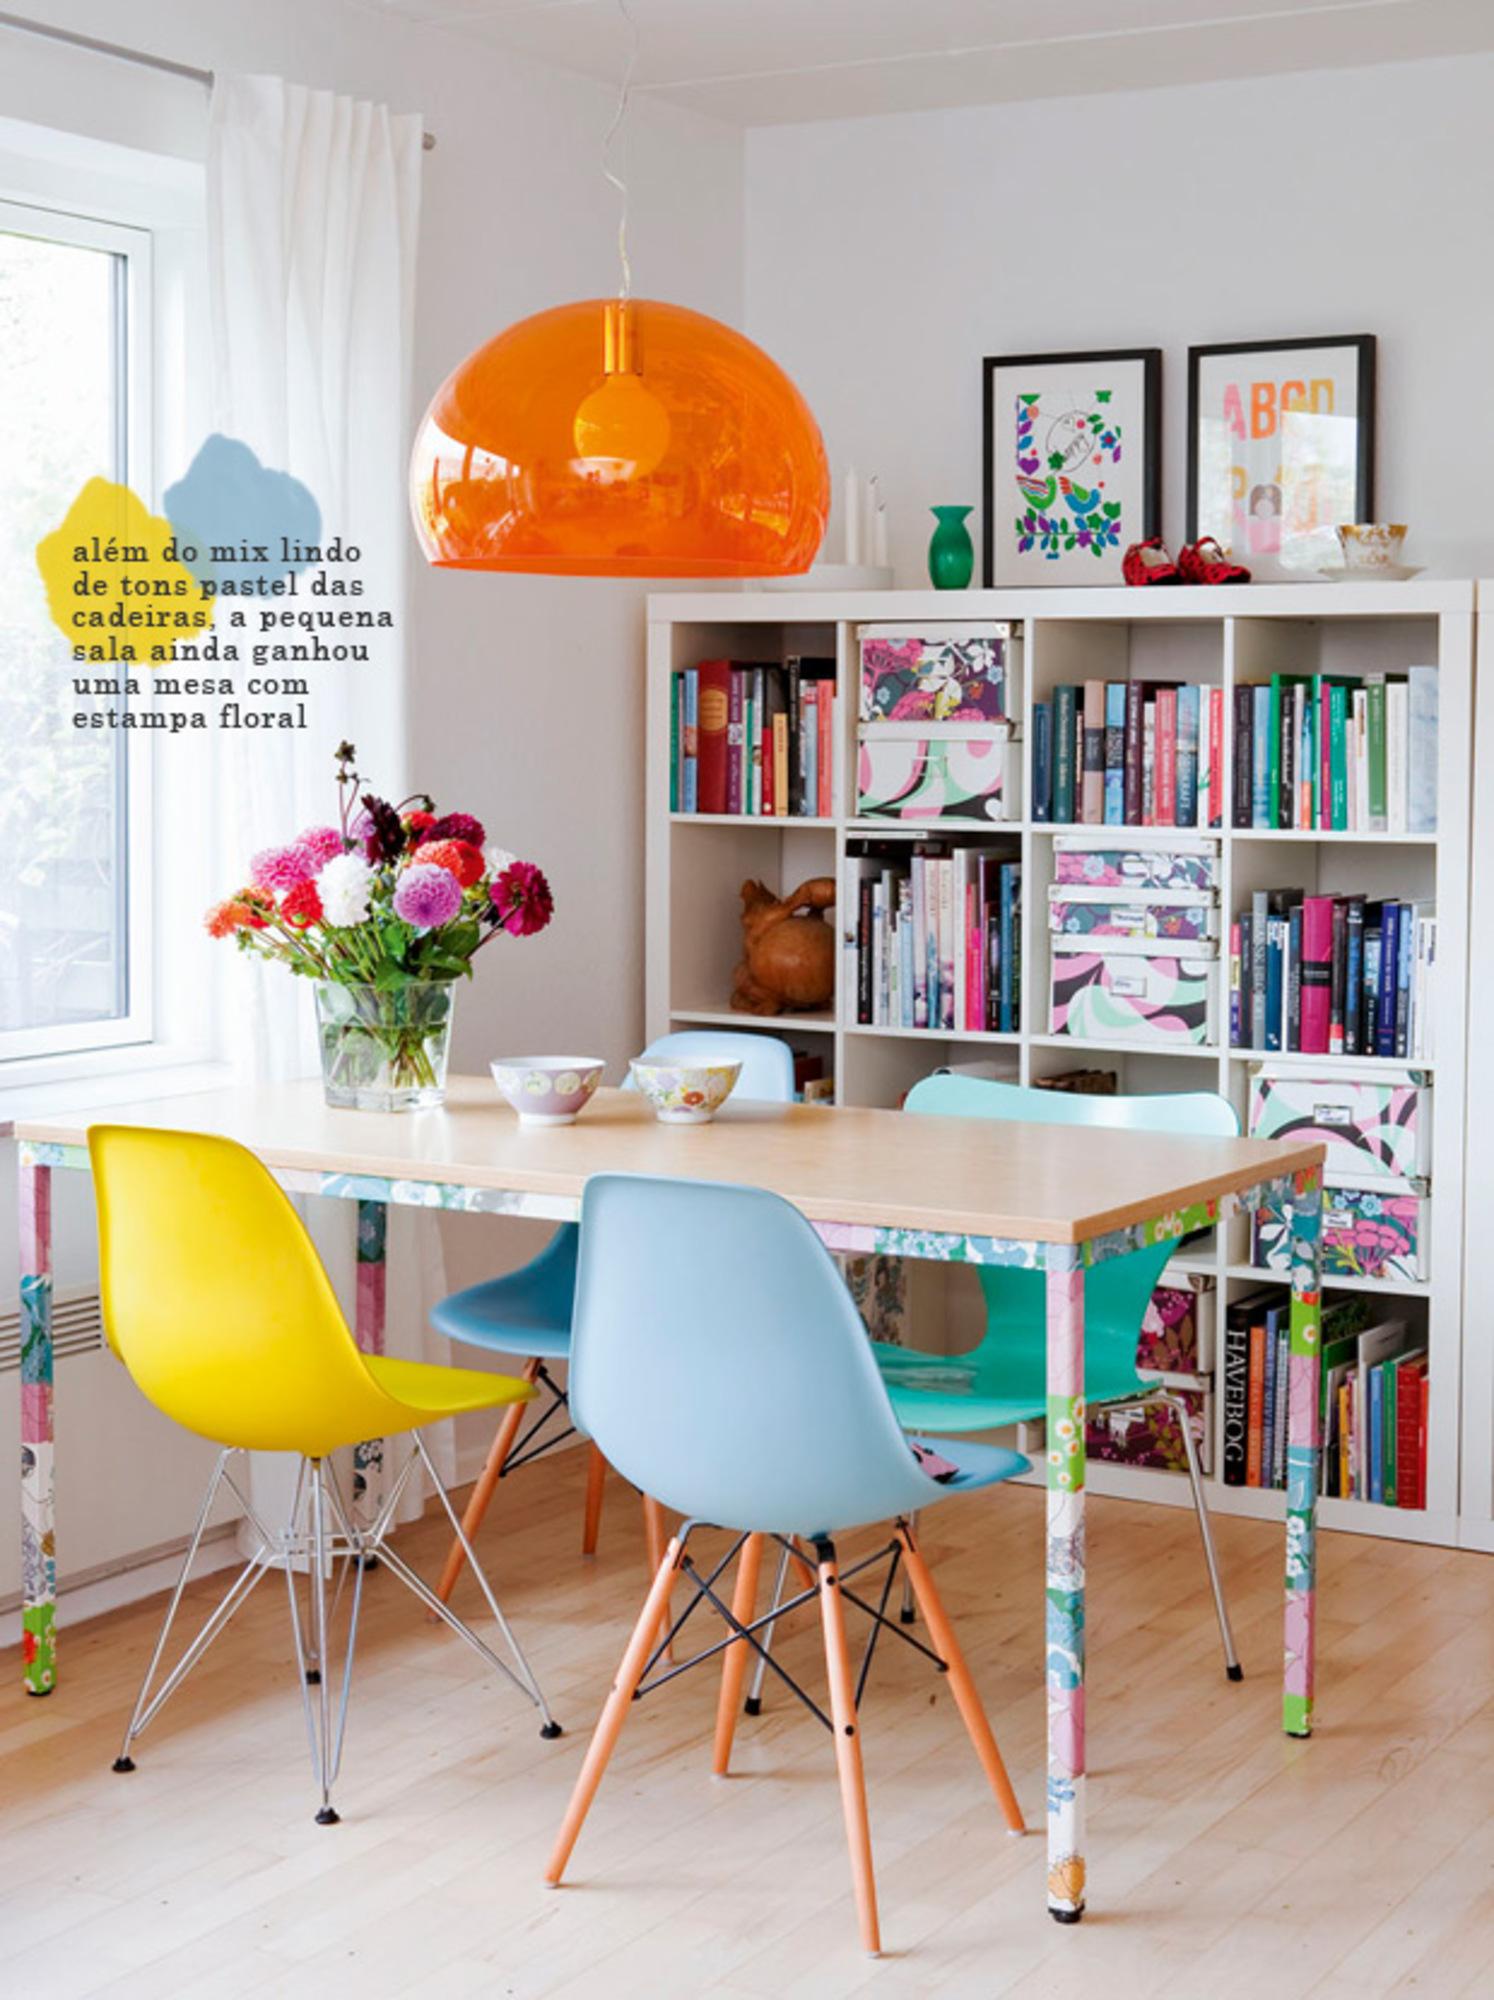 Cadeiras Coloridas Na Mesa De Jantar Casa De Valentina -> Decoracao De Sala Pequena Vermelha E Amarela